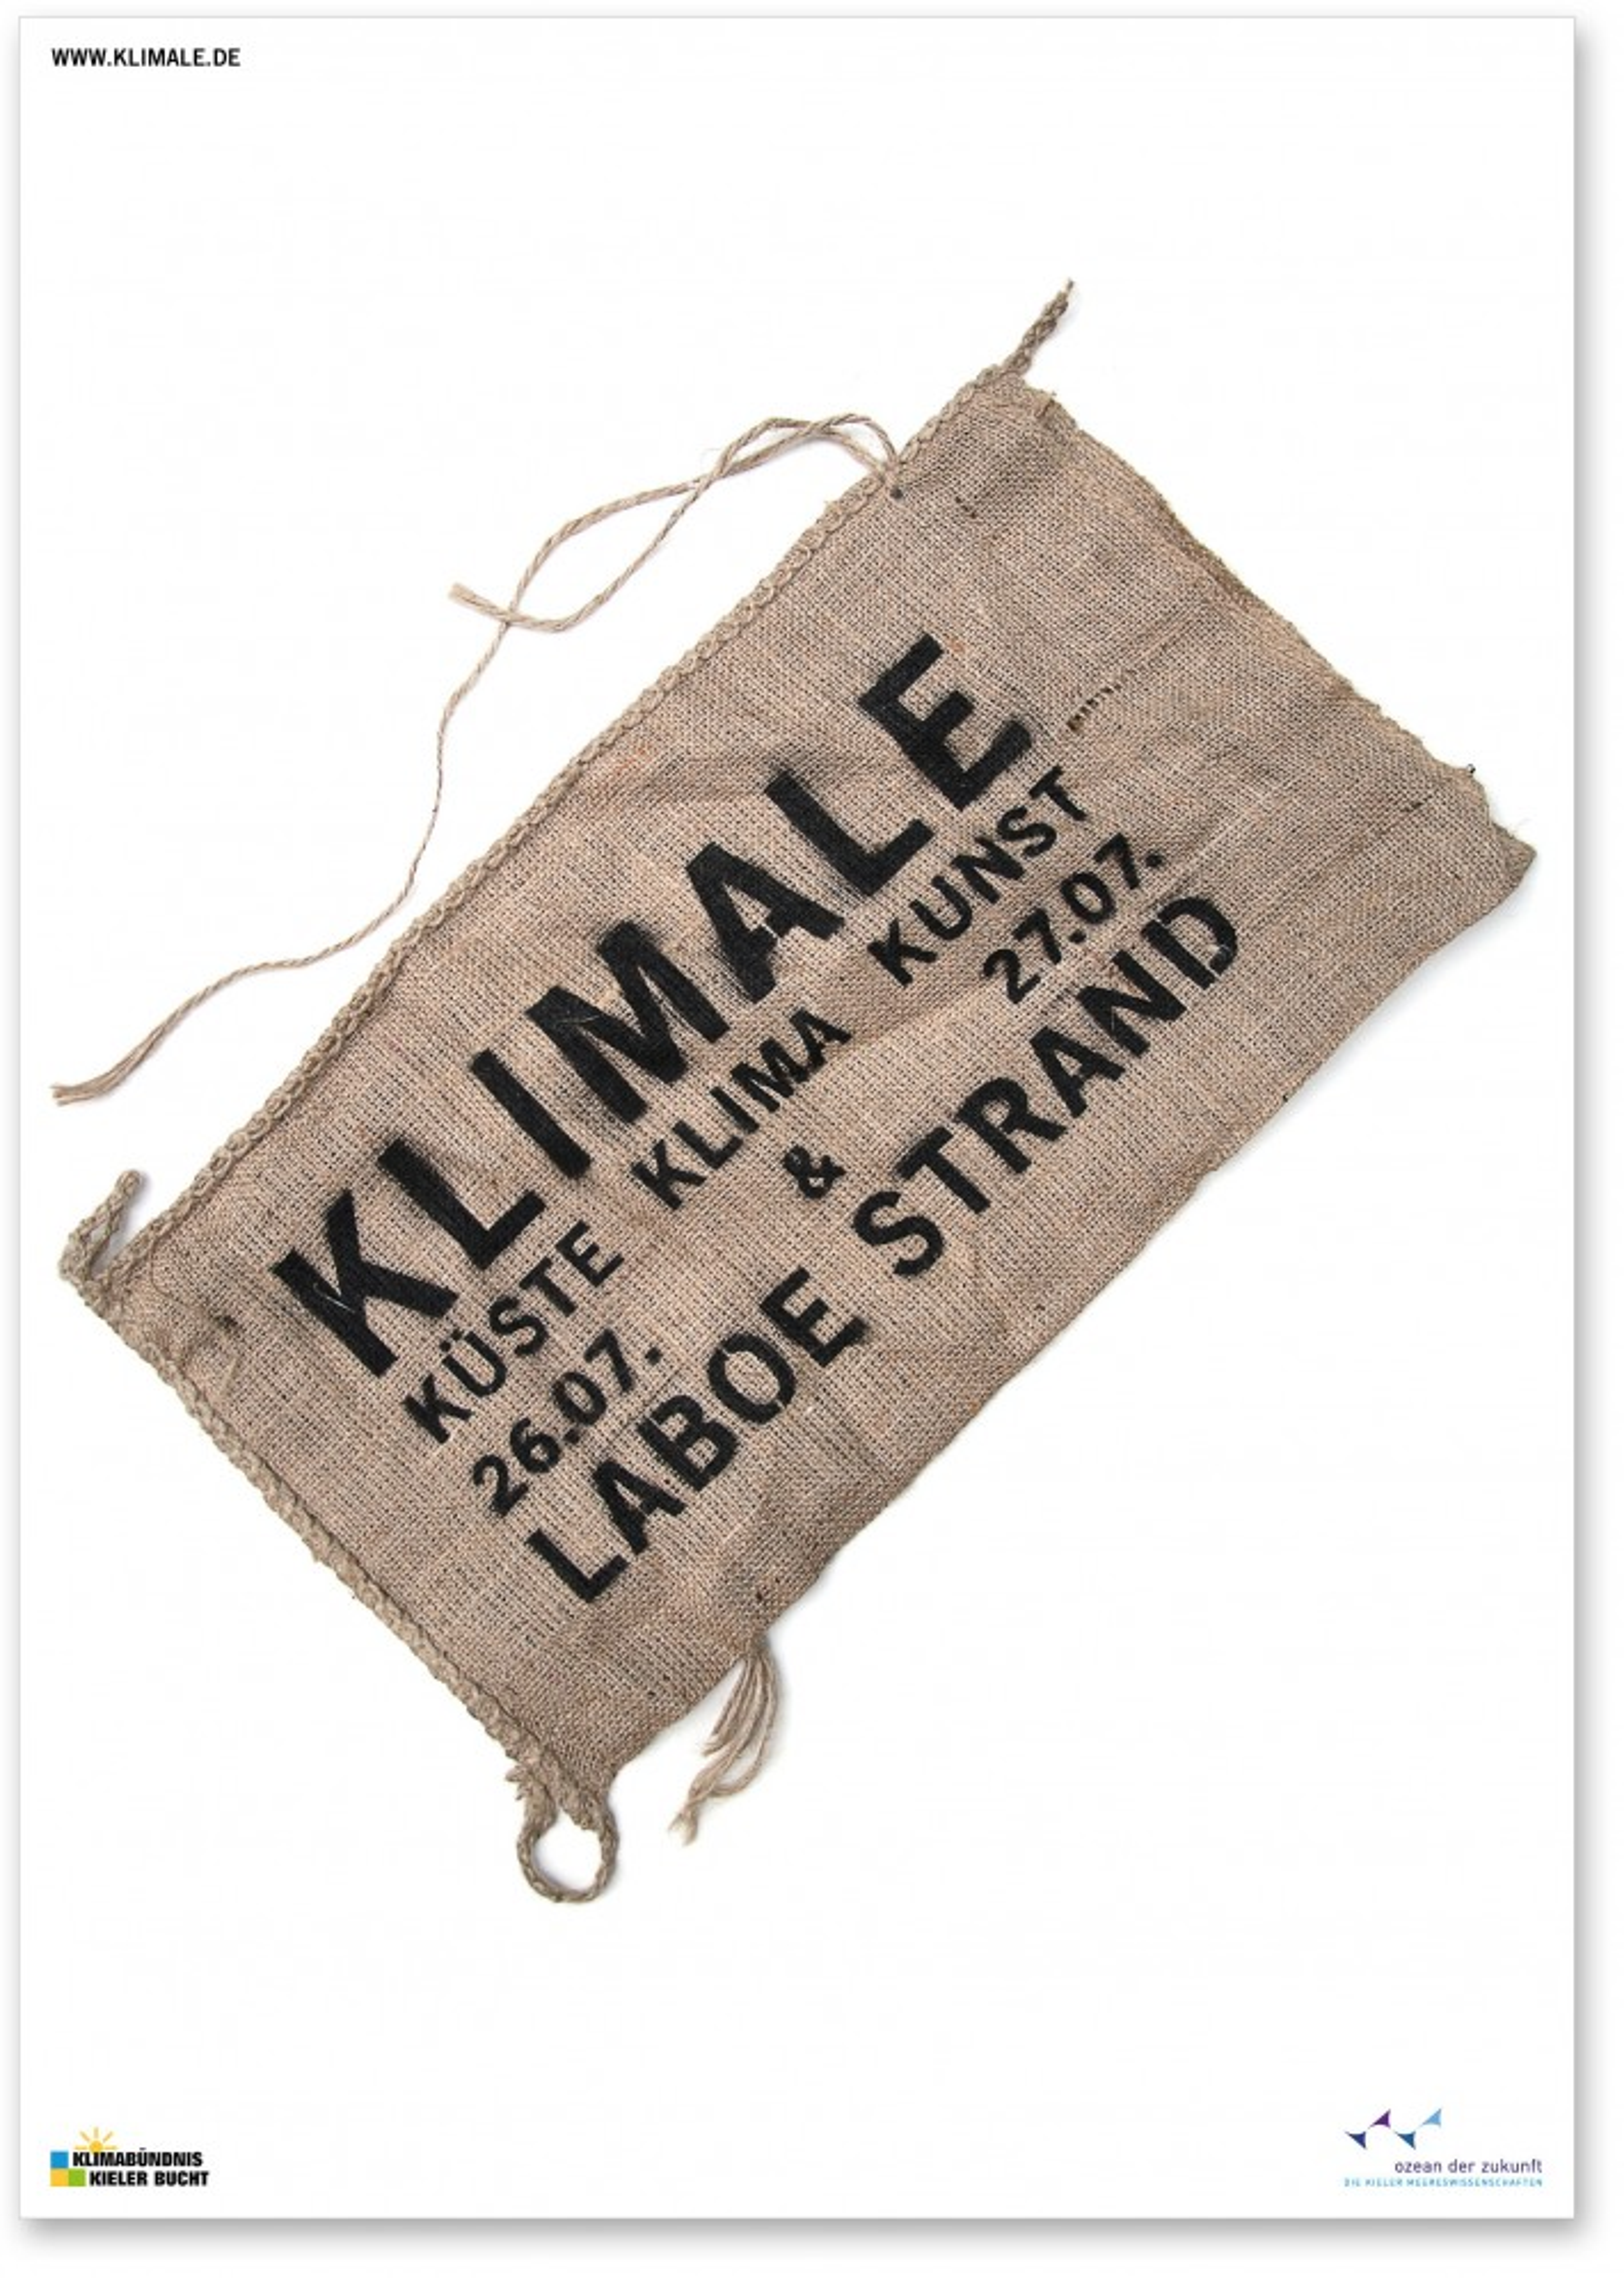 Plakat_Klimale